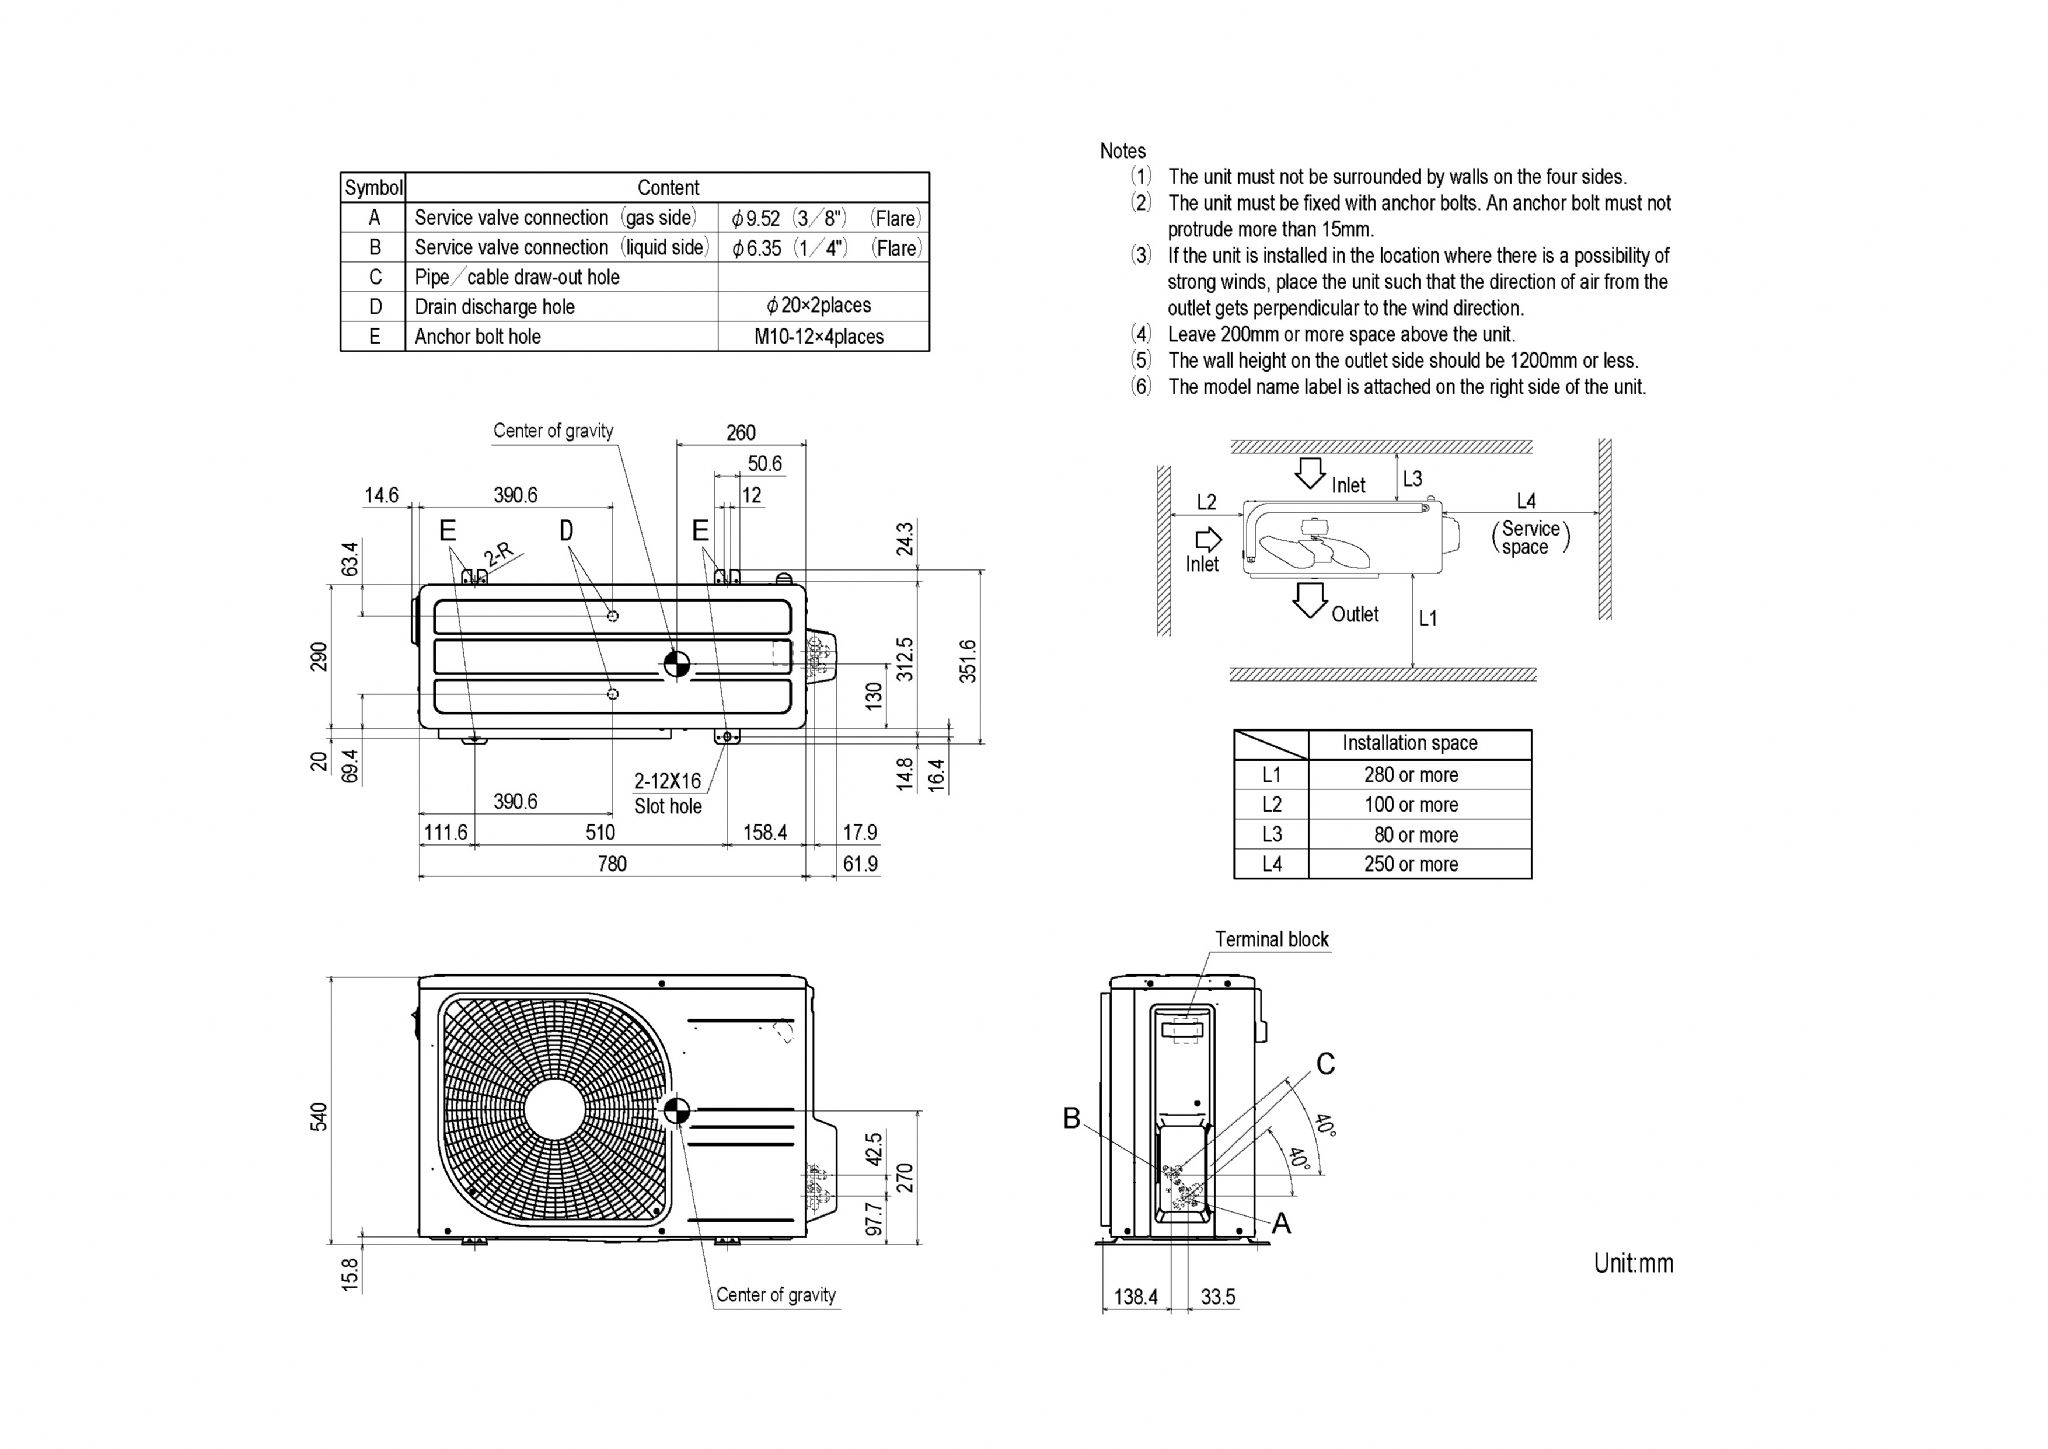 mitsubishi air conditioner wiring diagram wiring diagram 2001 Mitsubishi Eclipse Wiring-Diagram mitsubishi air conditioner wiring diagram